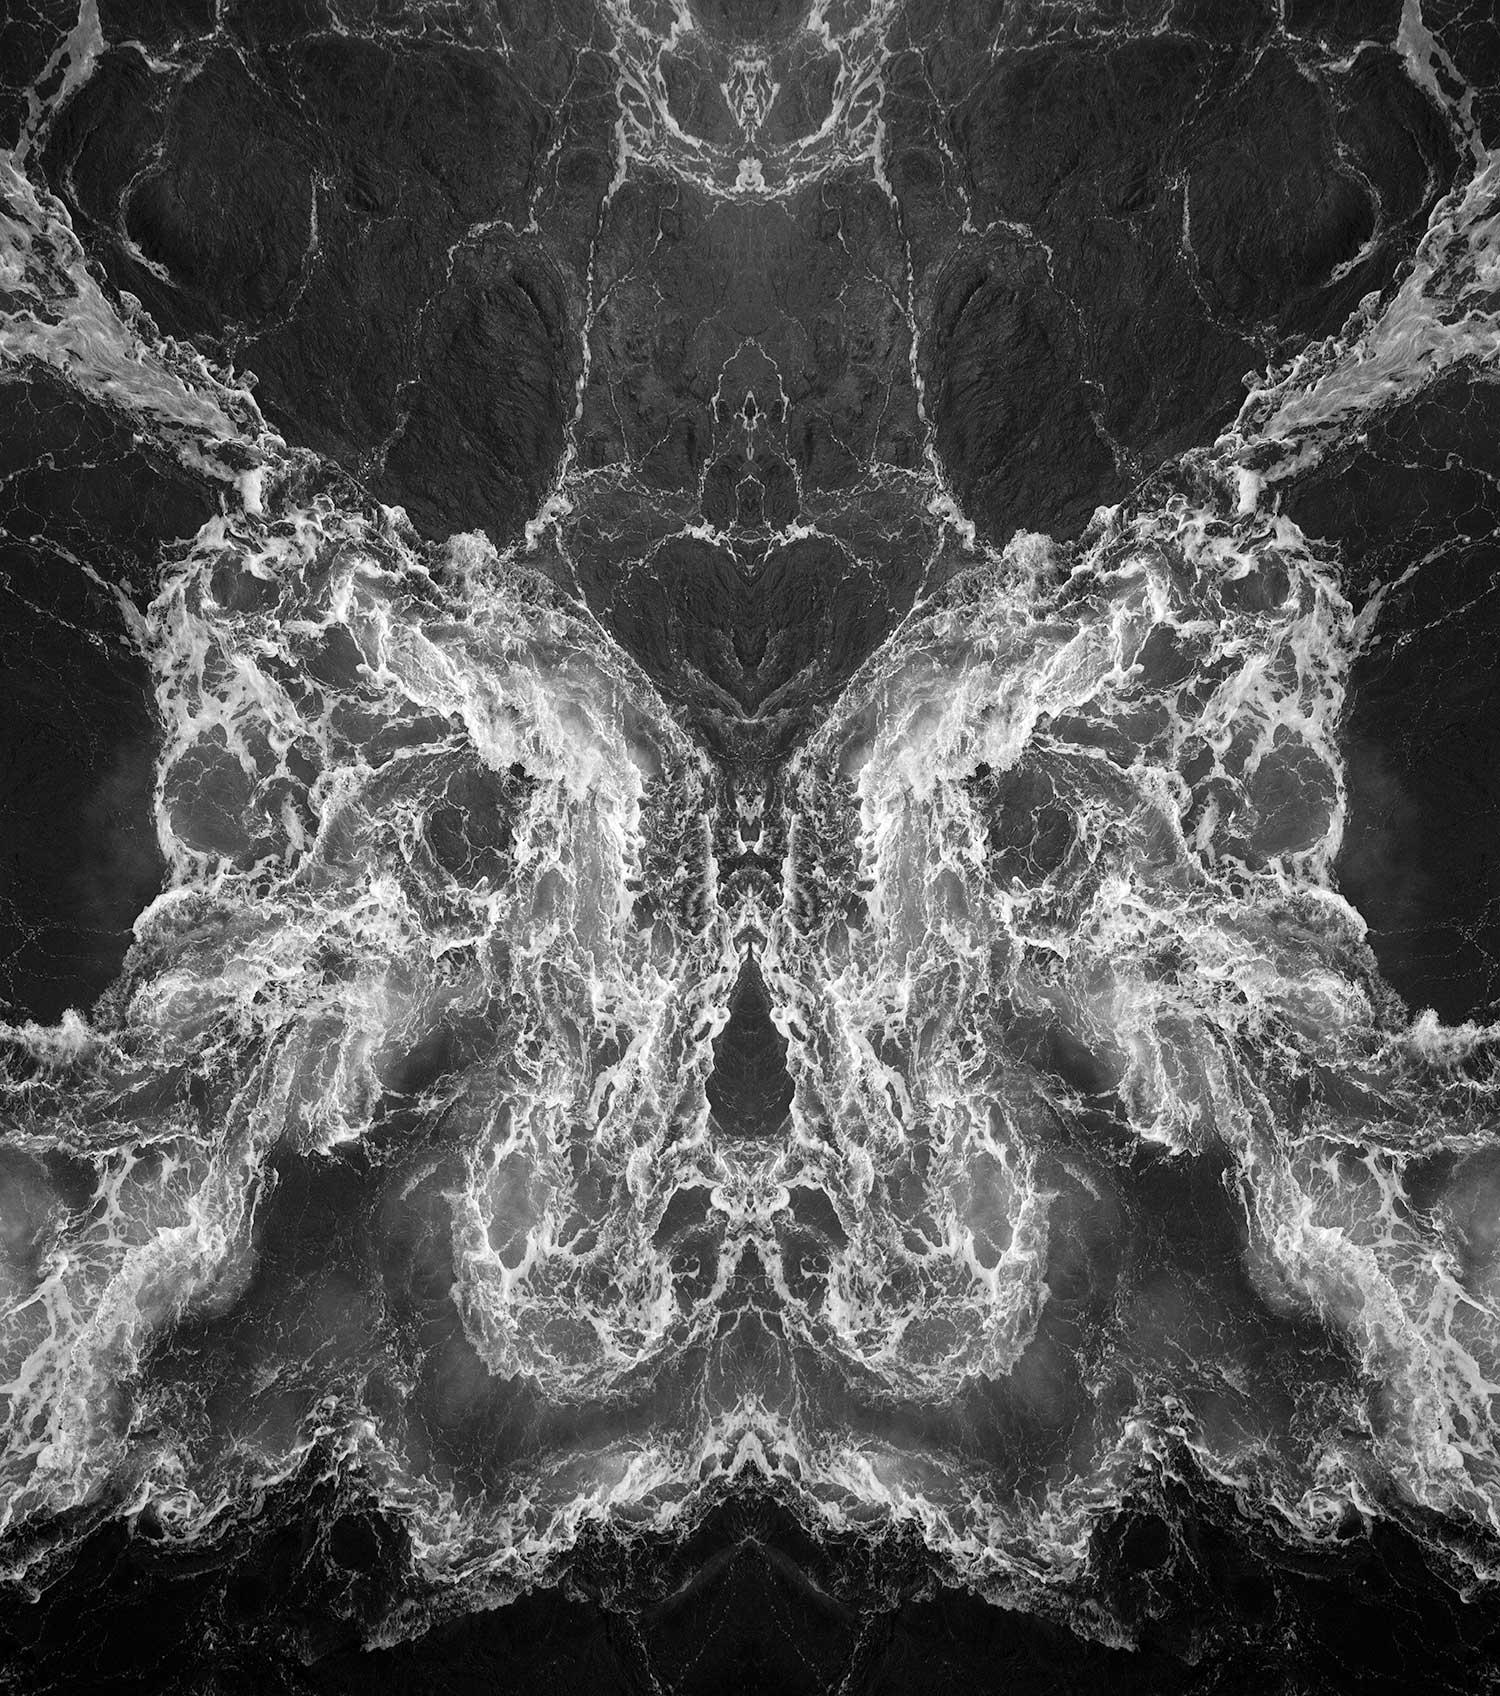 Elemental — 1 of 4